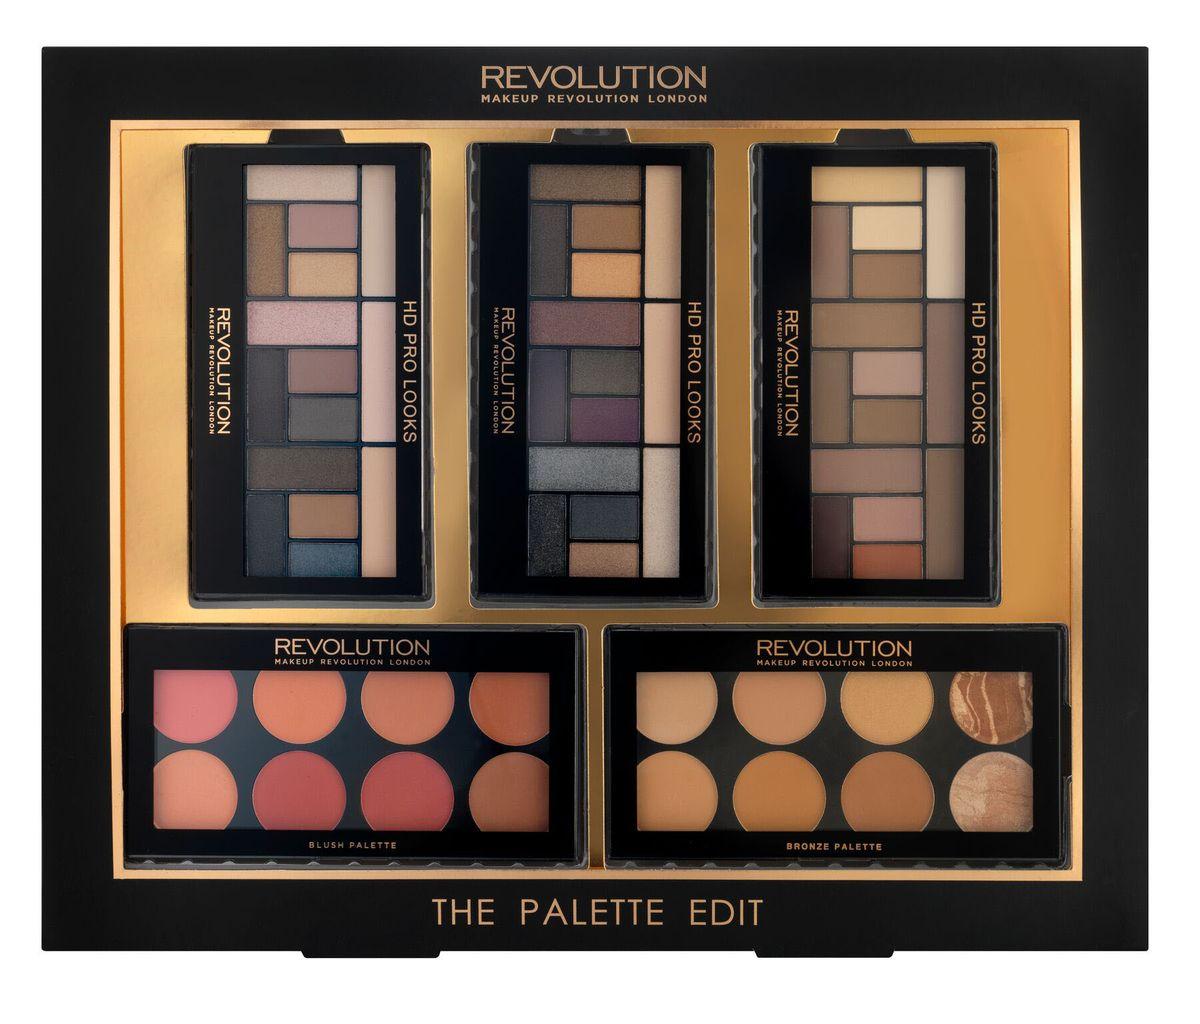 Makeup Revolution Набор для макияжа The Palette Edit017370В набор входят: 3 палетки теней HD PRO LOOKS EYESHADOW PALETTE матовых и шиммерных оттенков, палетка румян BLUSH PALETTE, палетка BRONZE PALETTE.